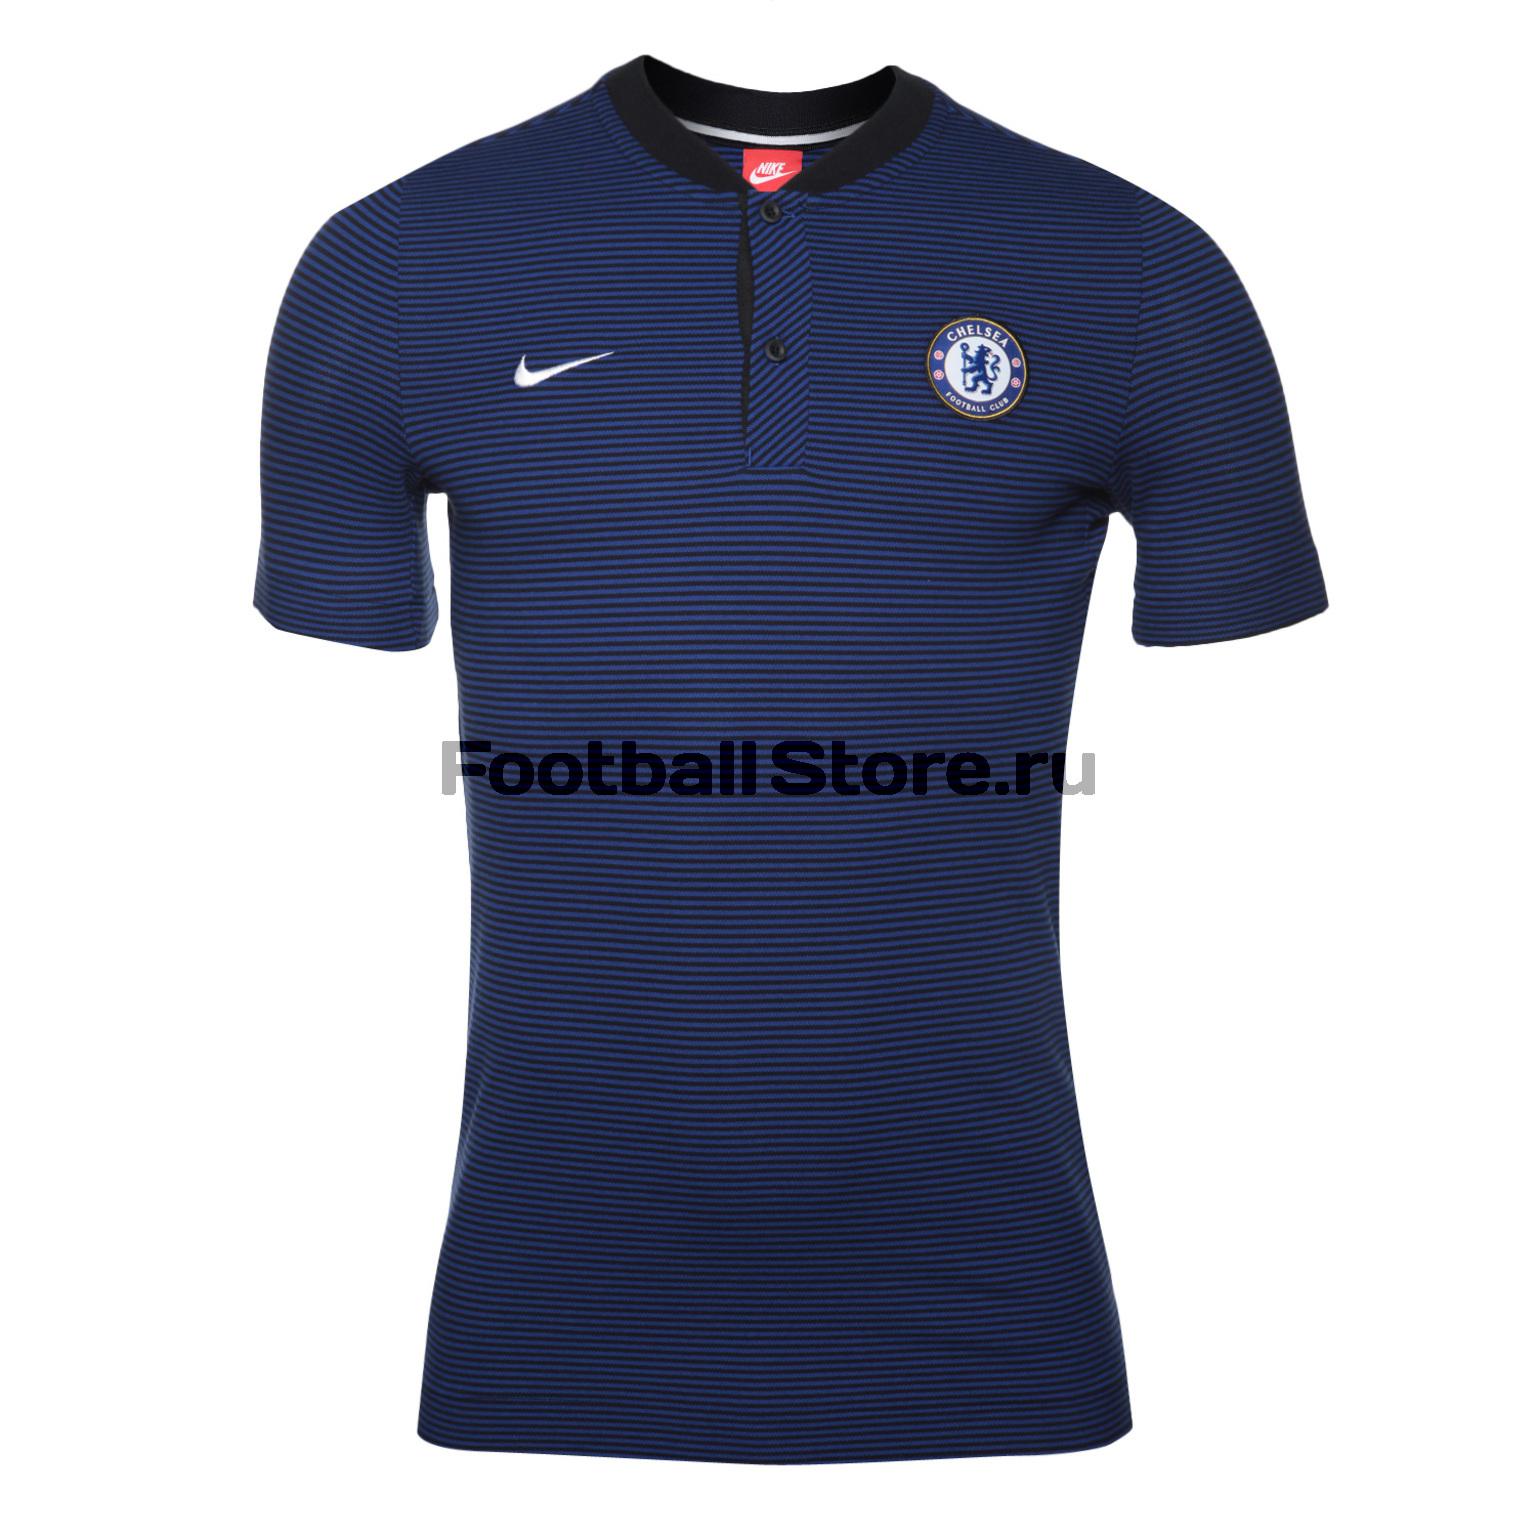 Поло Nike Chelsea Modern GSP AUT 905474-010